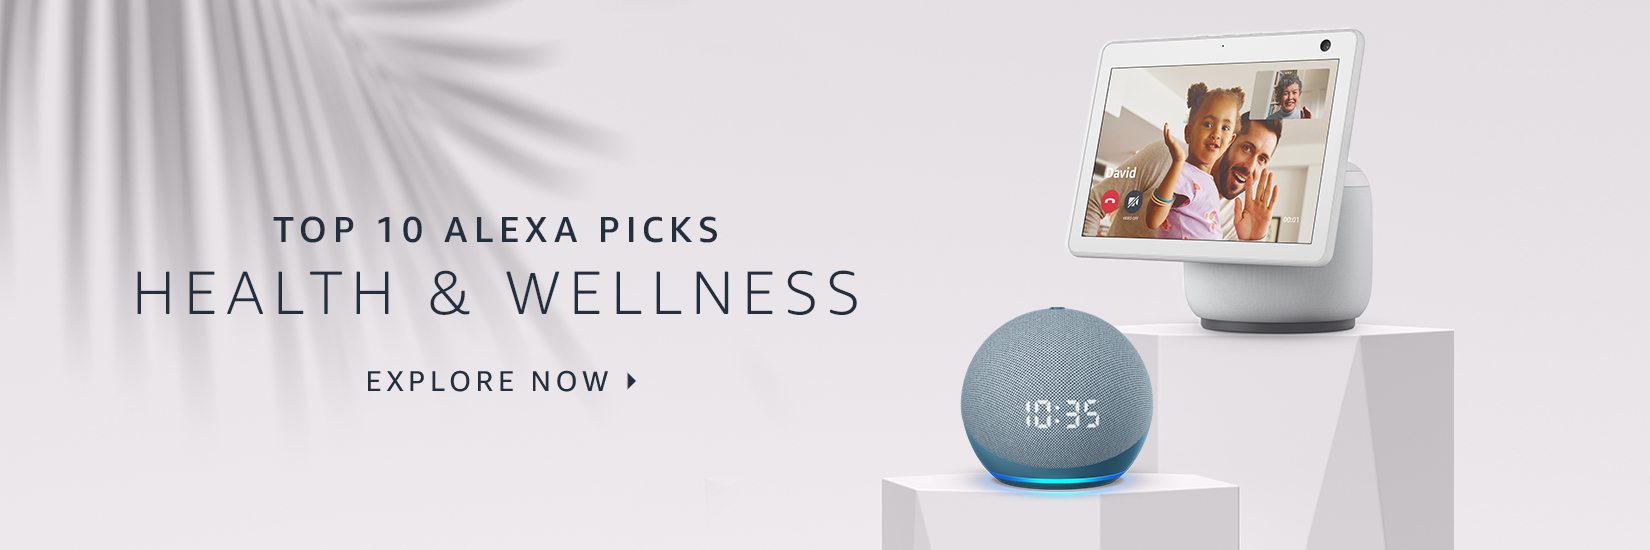 Top 10 Alexa Picks for Health and Wellness